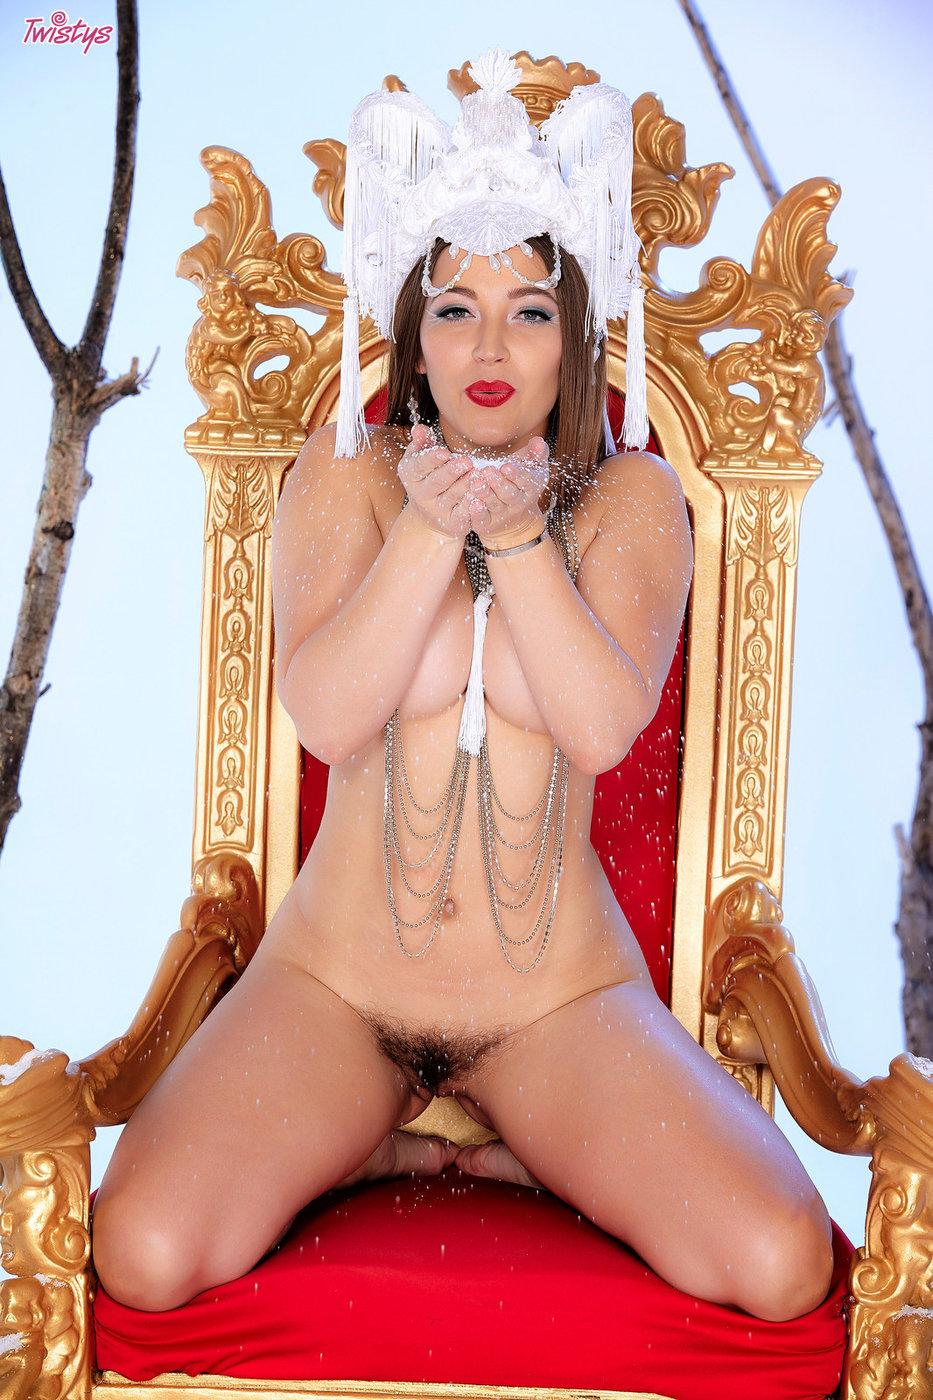 Nude alyson queen nude showers toronto